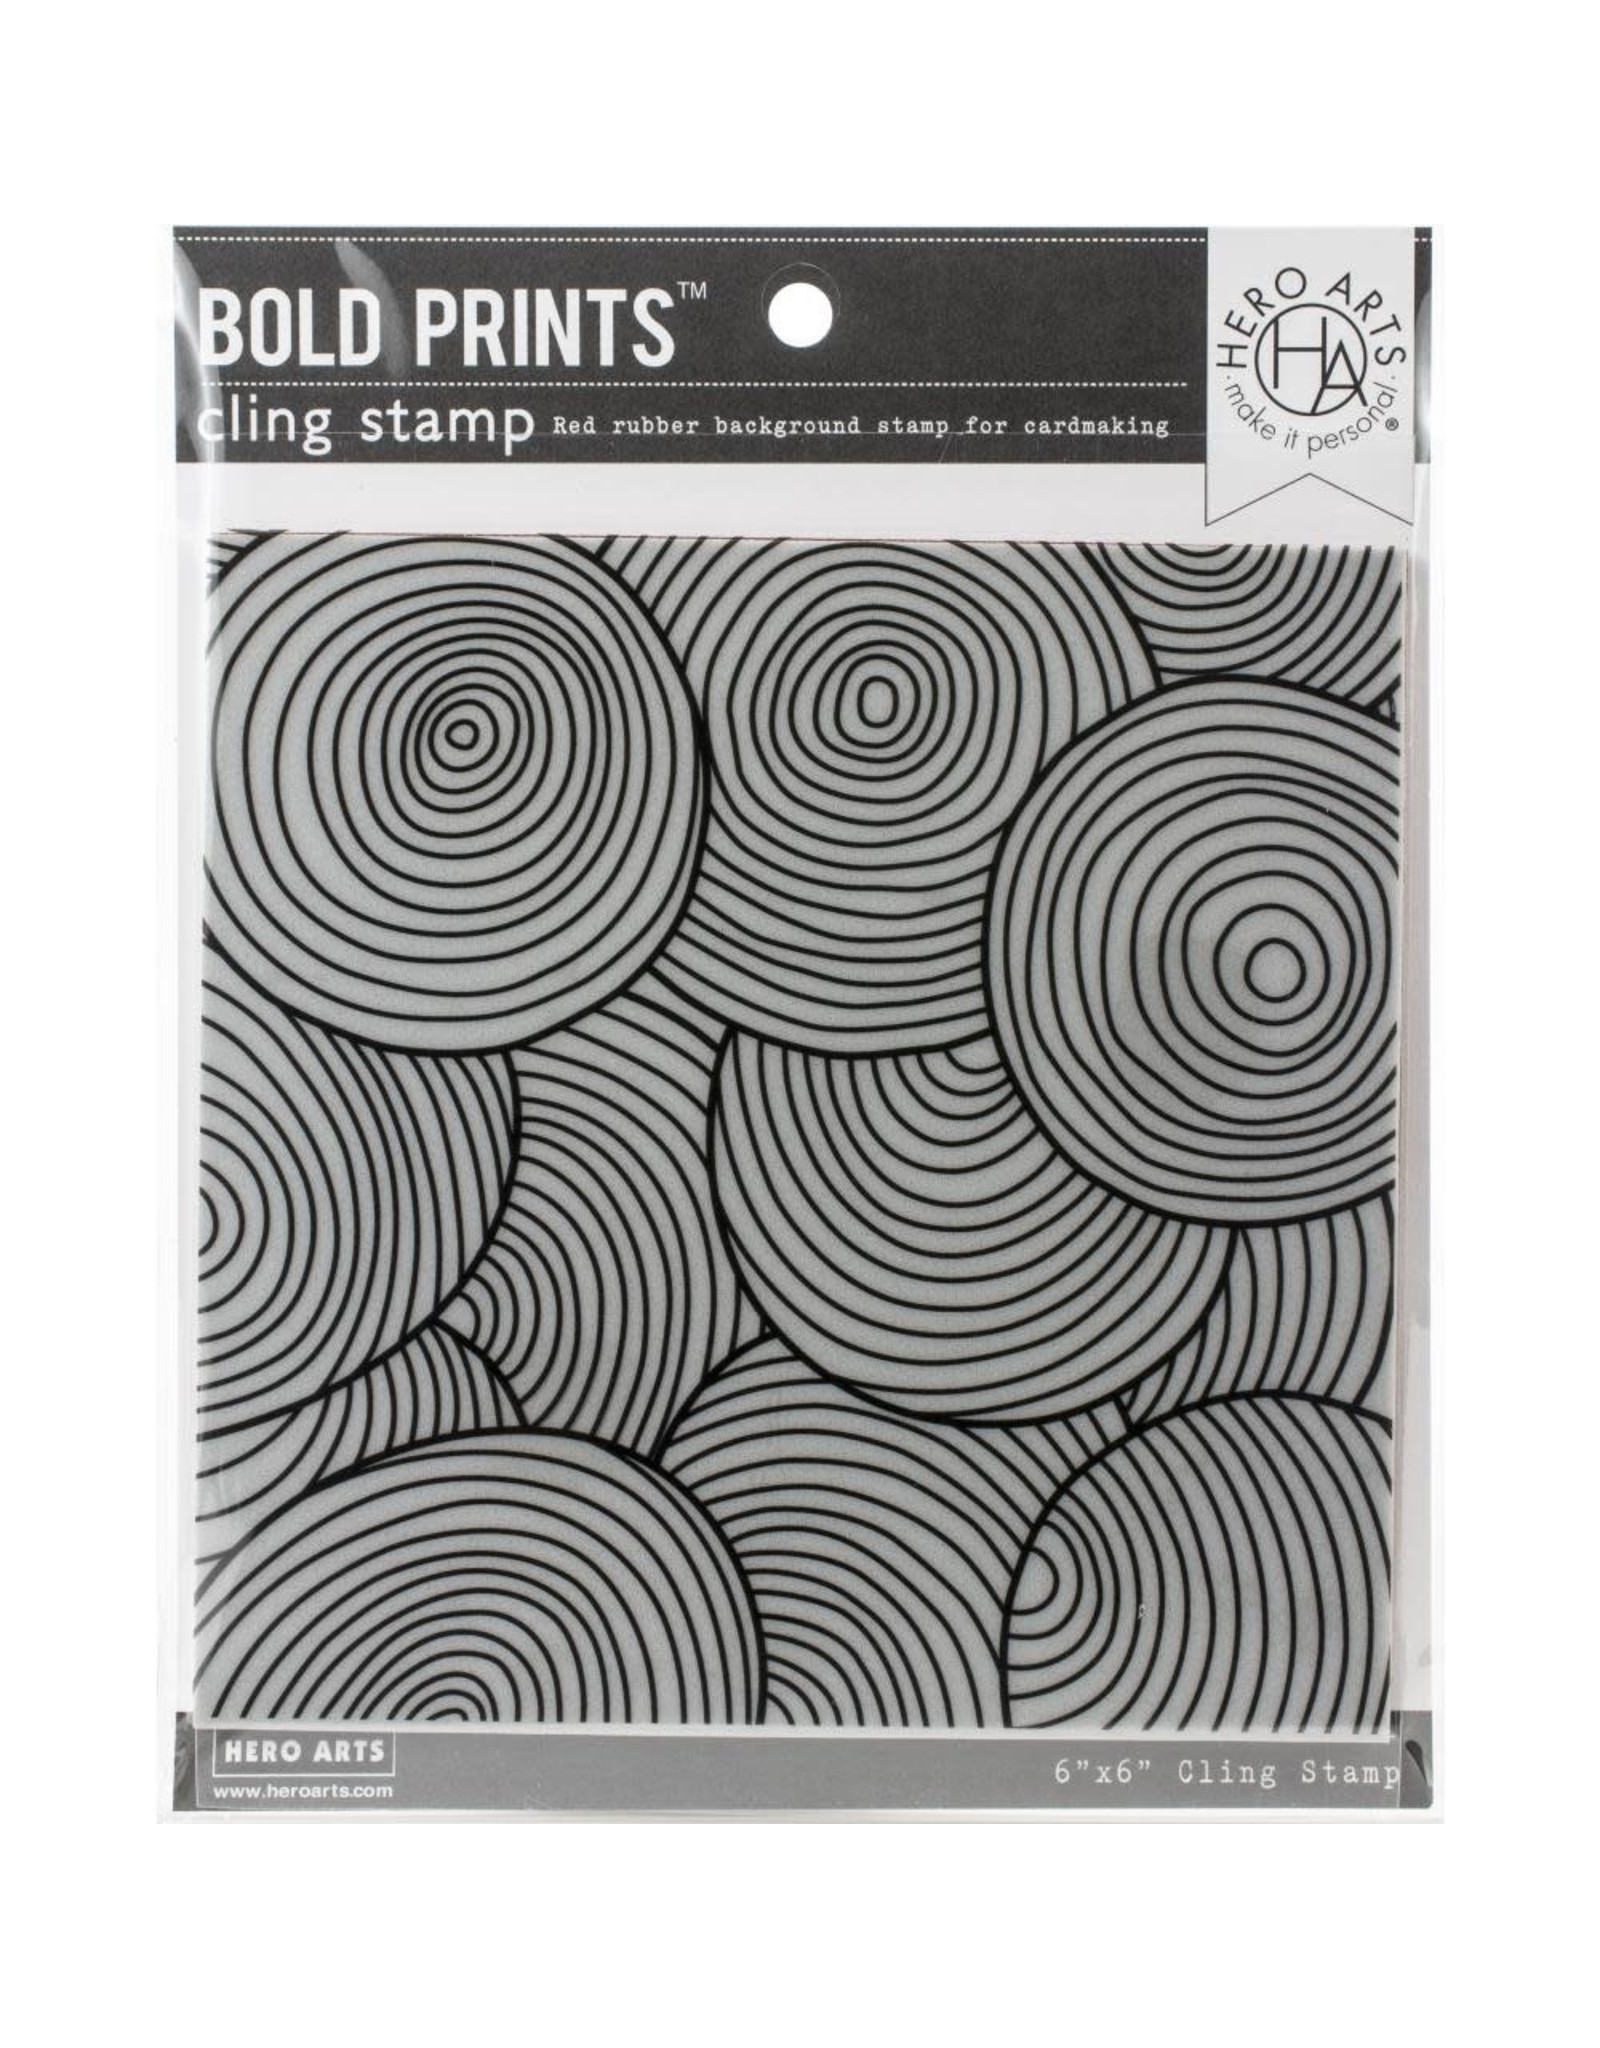 Hero Arts Circle Pattern Bold Prints 6x6 Background Stamp